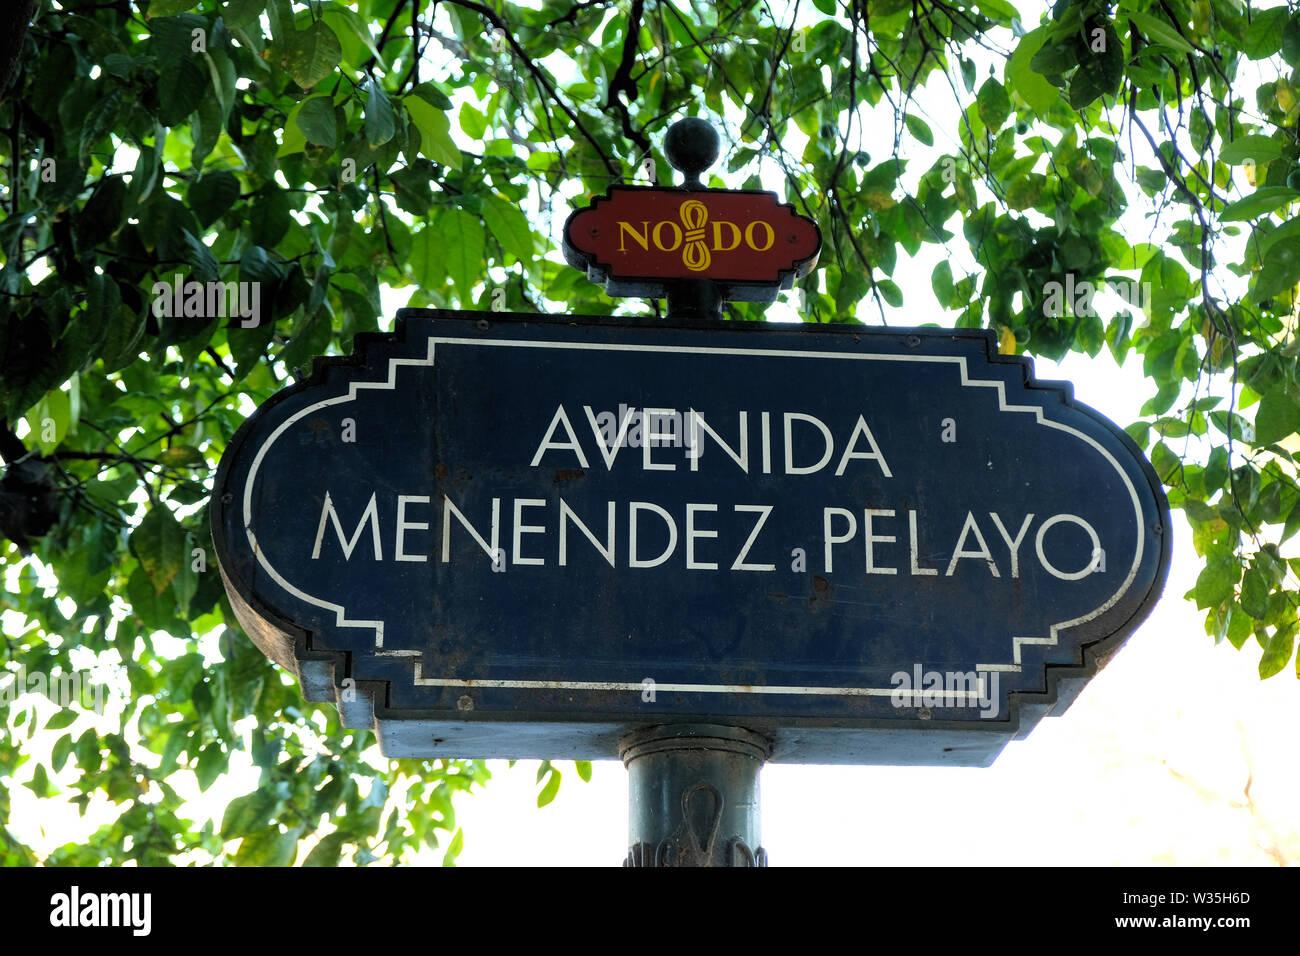 Street sign for Menendez Pelayo avenue with the NO8DO symbol in Seville, Spain; Menendez Pelayo was a Spanish scholar, historian, literary critic. - Stock Image